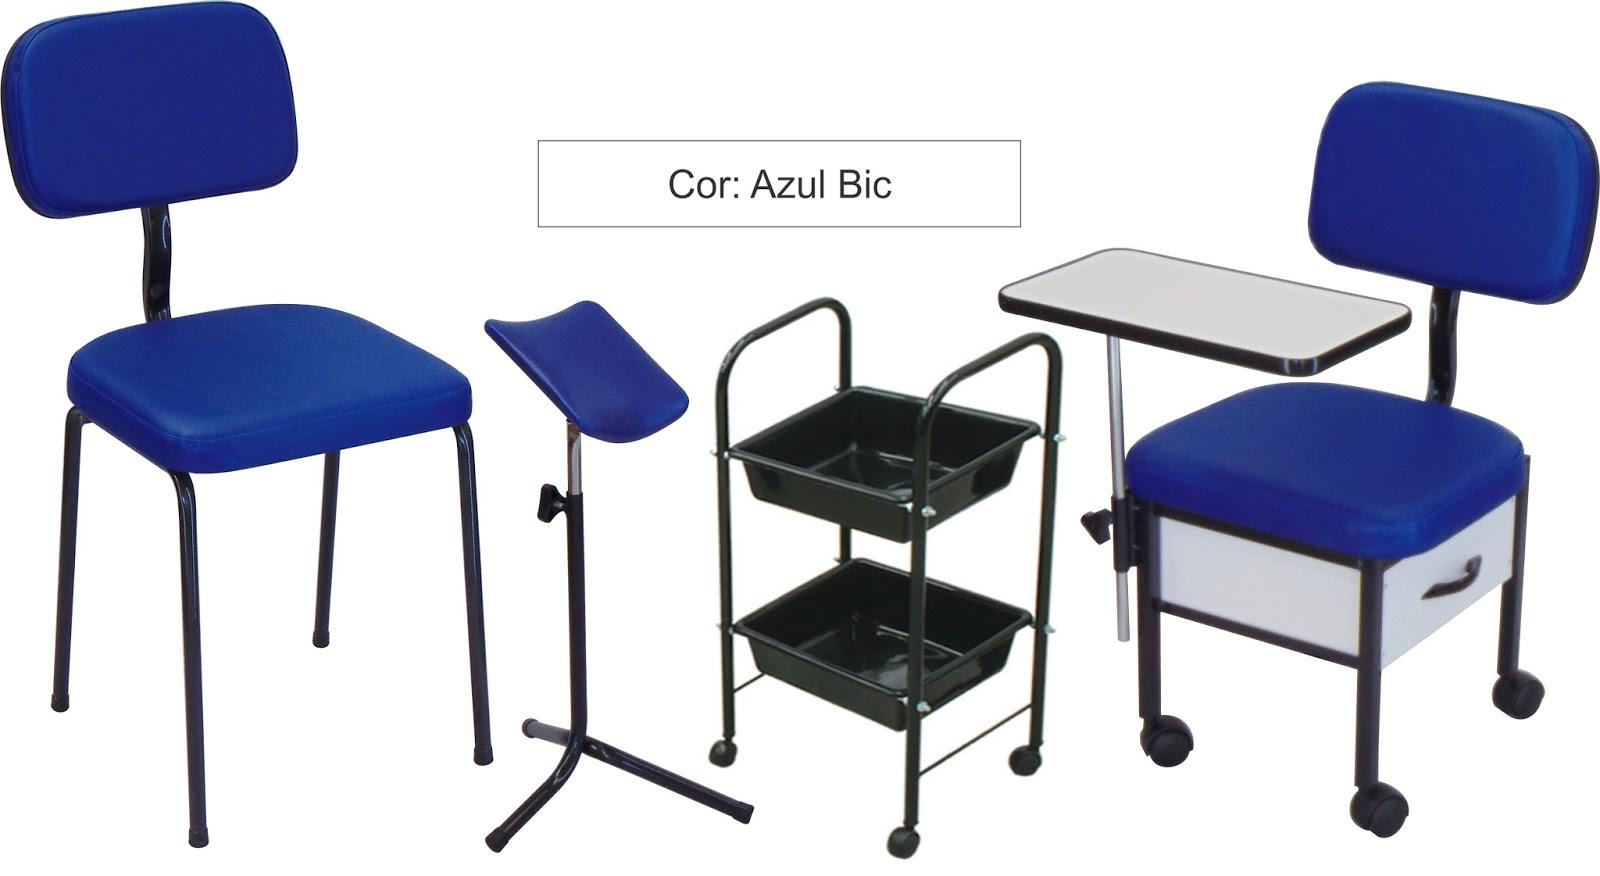 plus azul bic